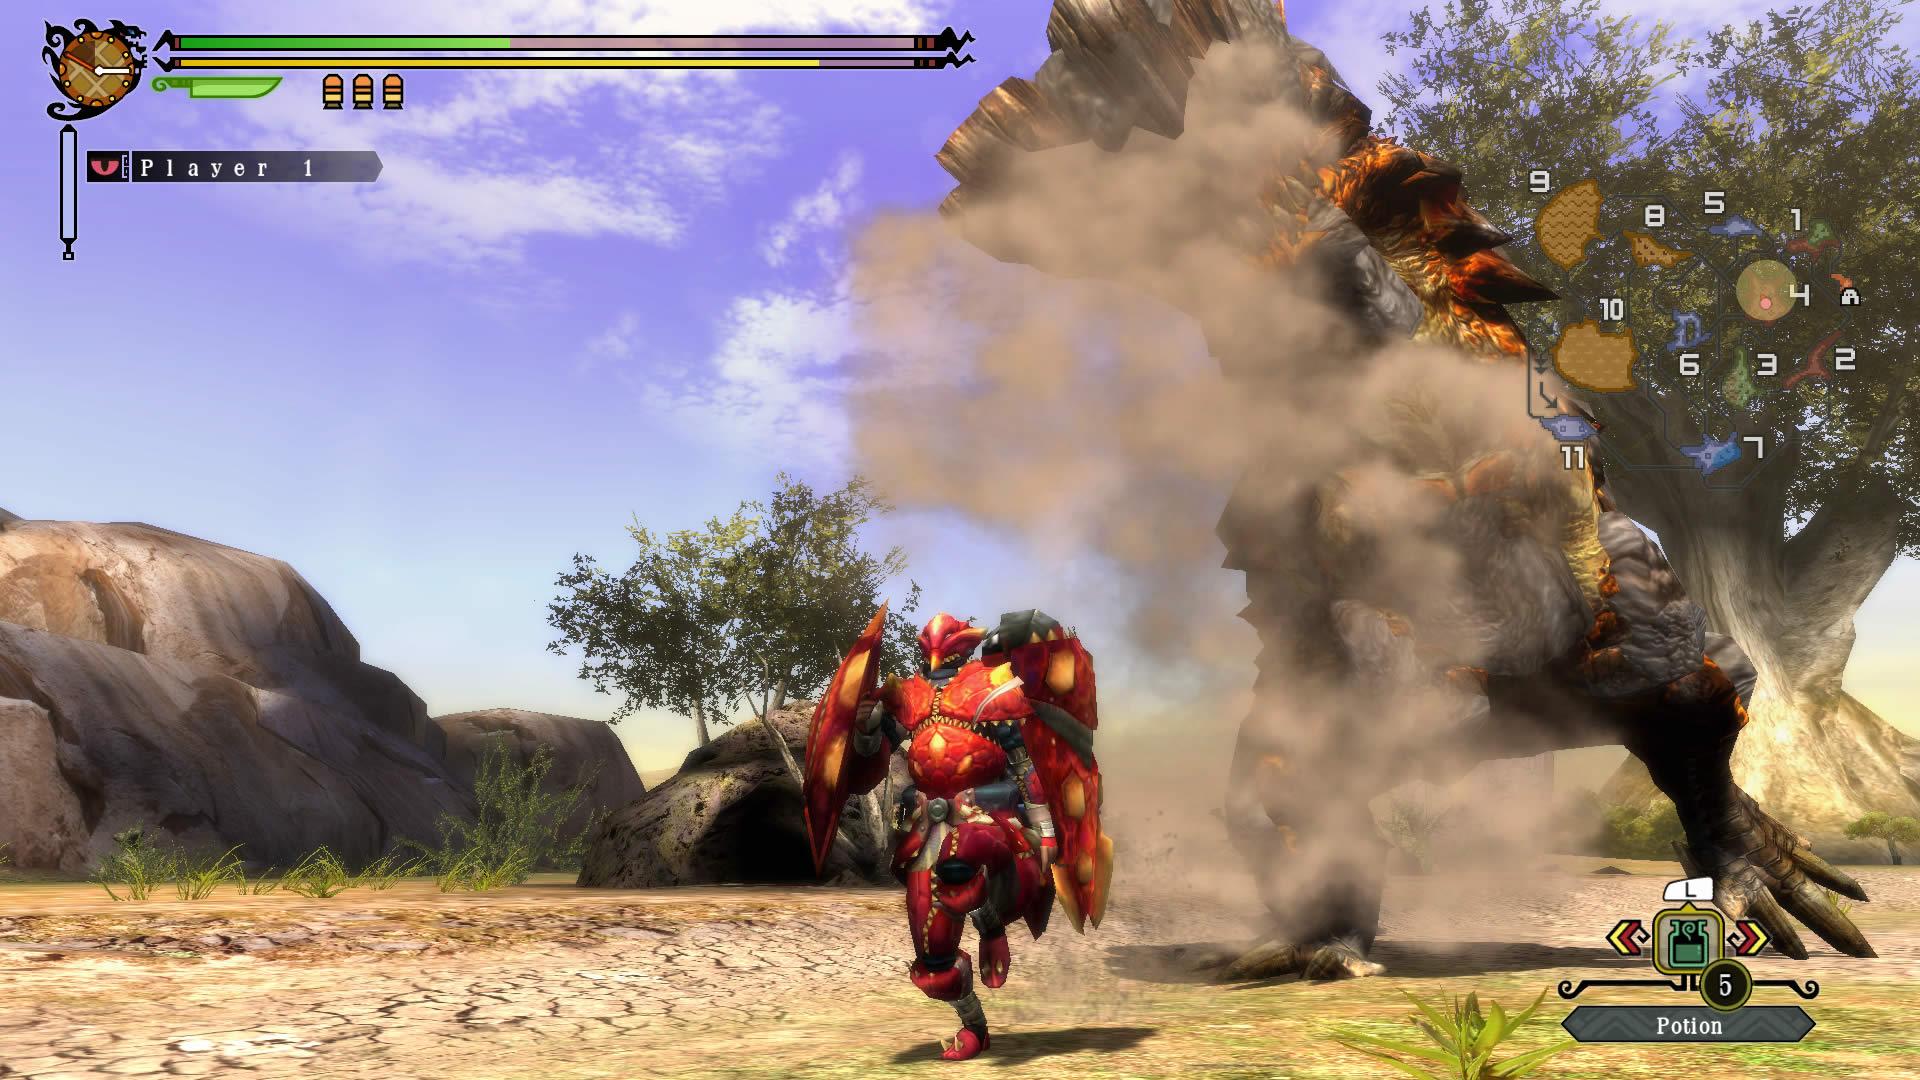 Monster hunter ultimate wii u screenshots nintendotoday